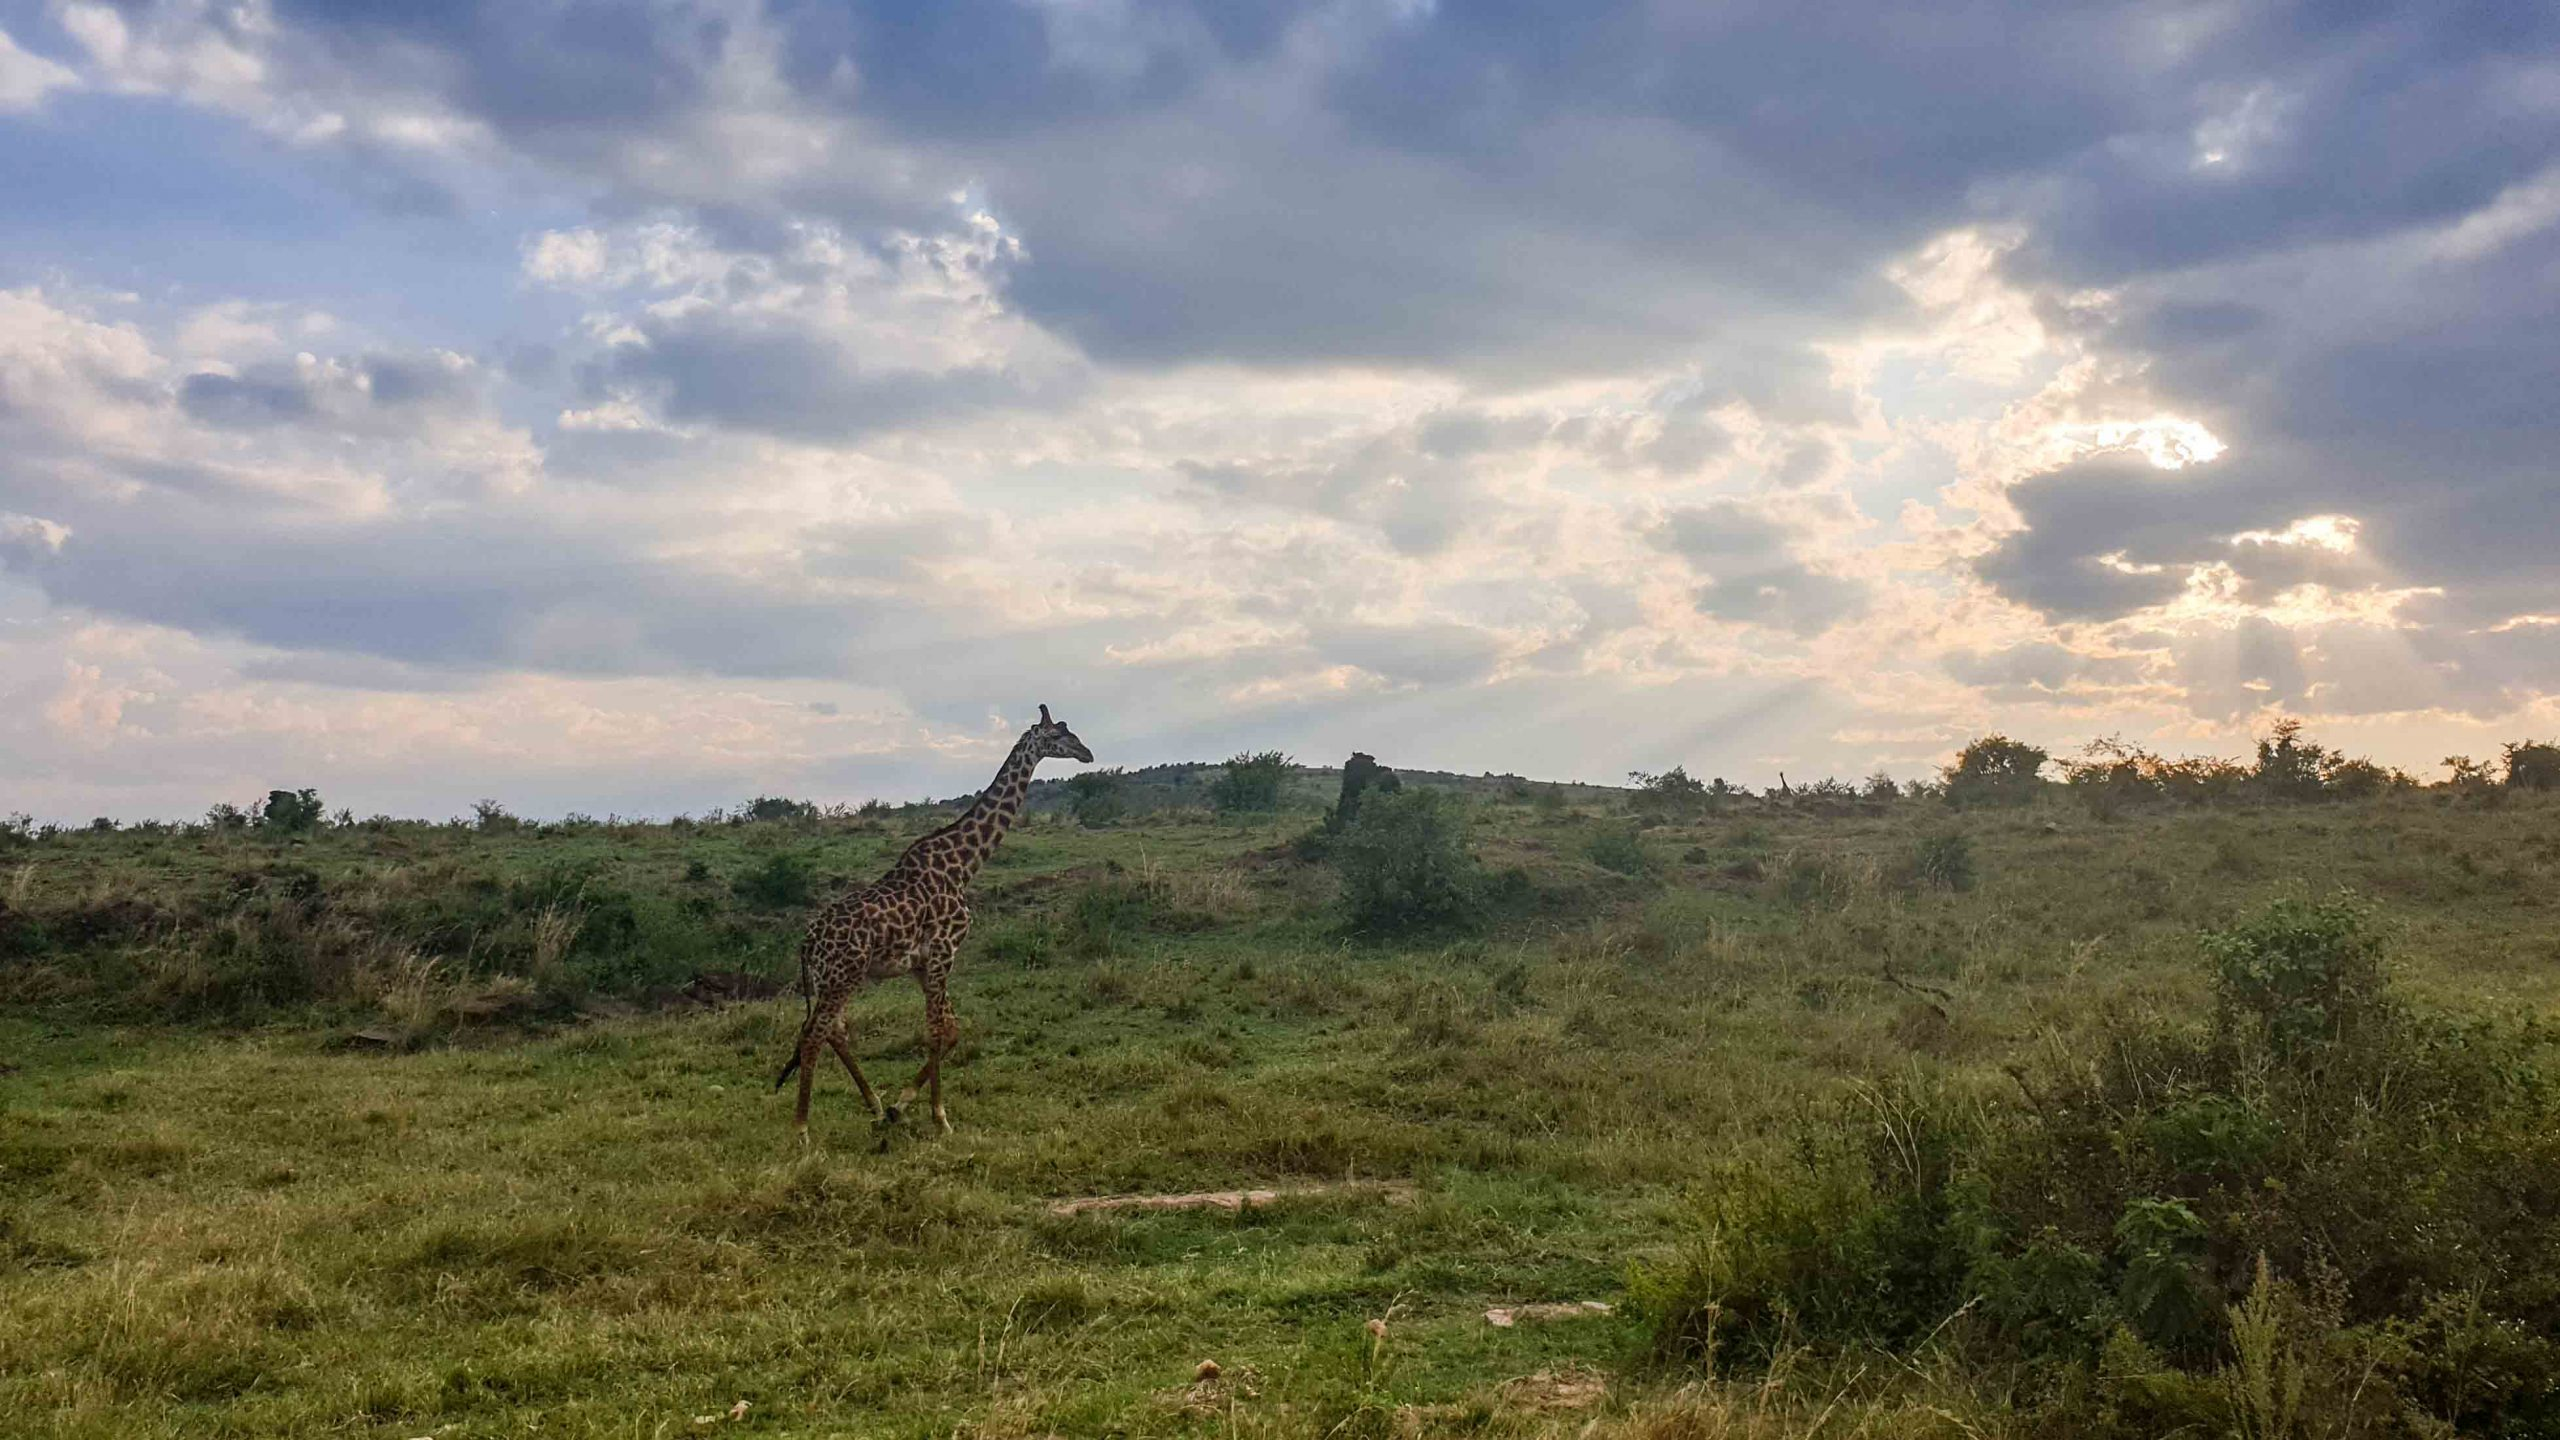 Jirafa en Masai Mara, Kenia